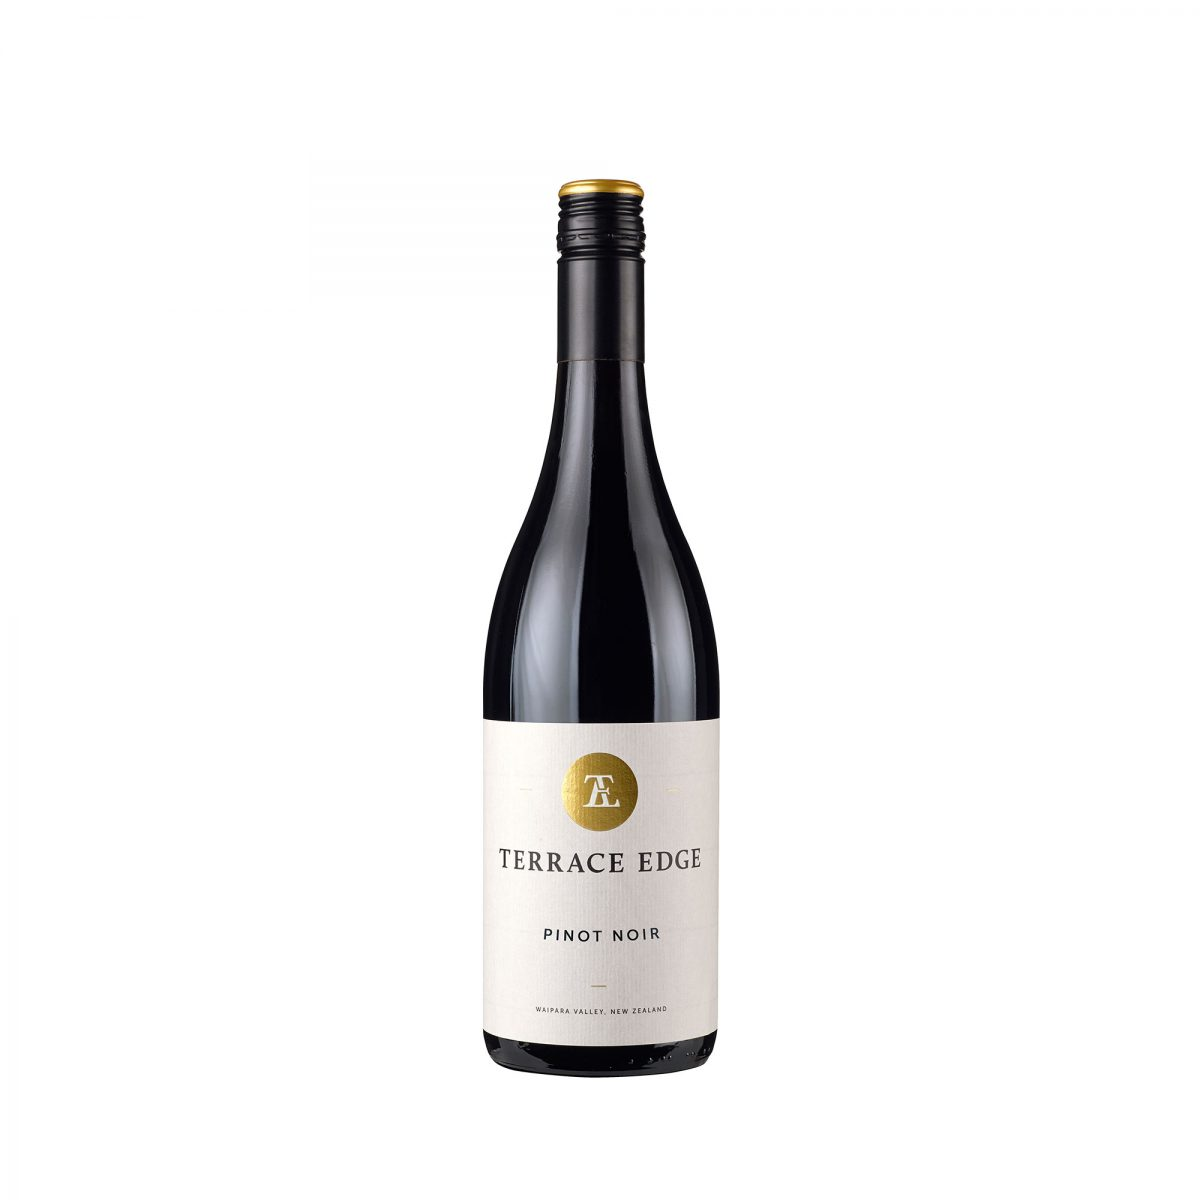 Terrace Edge Pinot Noir 2016 - 2 pack